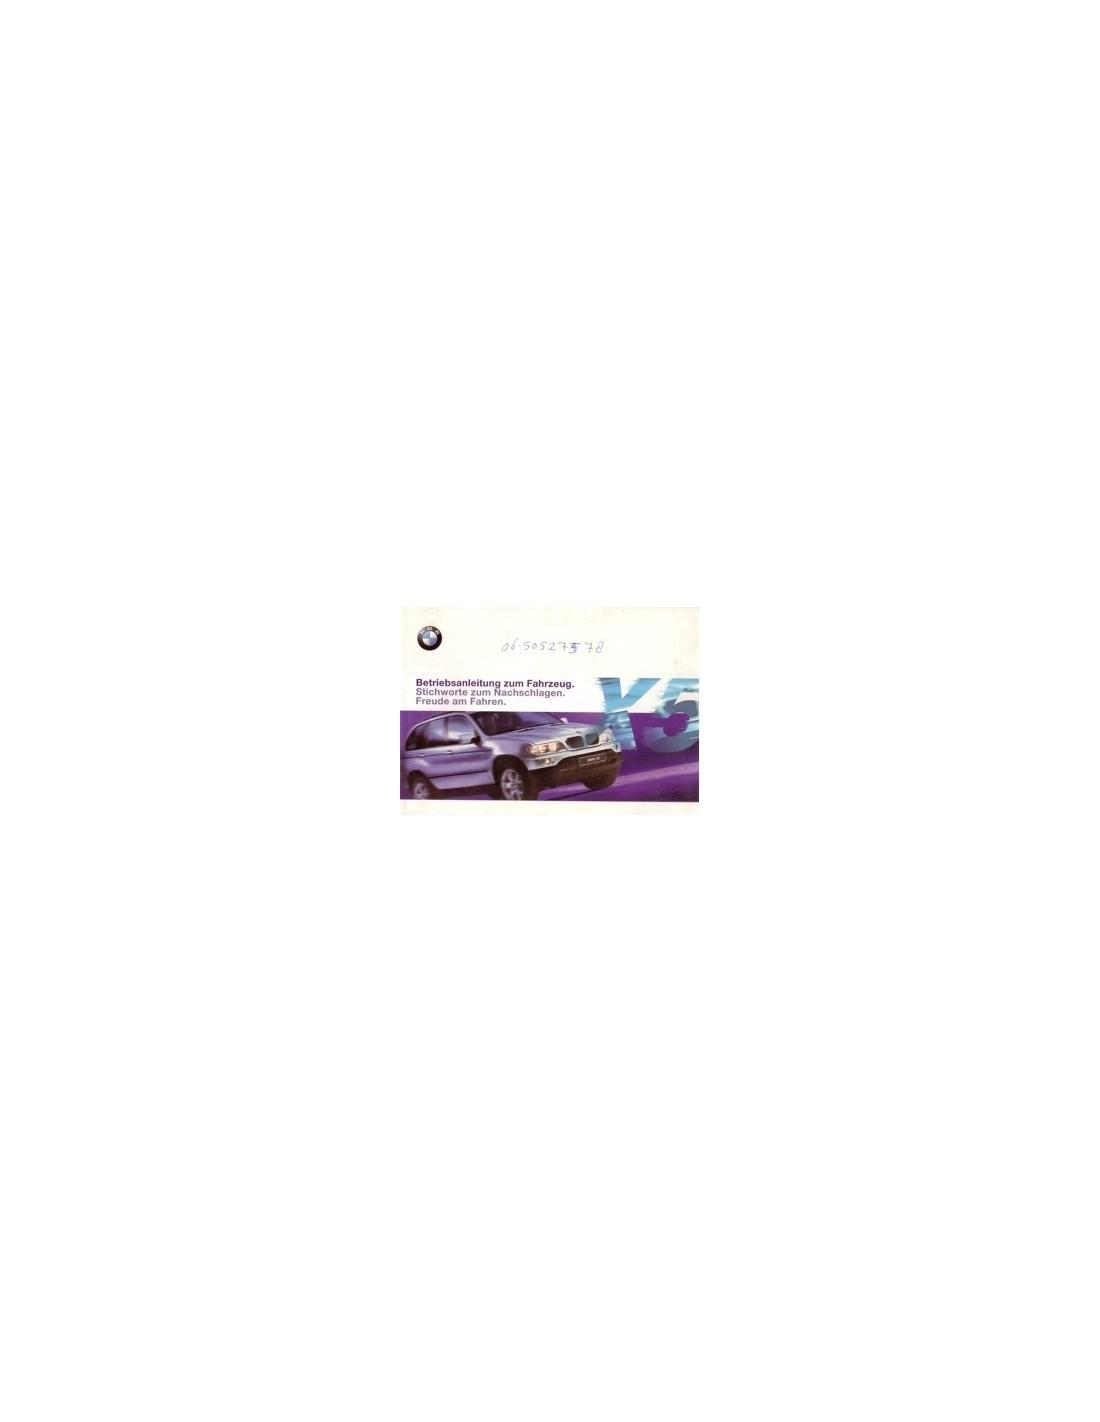 2000 bmw x5 owners manual handbook german automotive literature europe rh autolit eu 2015 BMW X5 2000 BMW X5 Problems